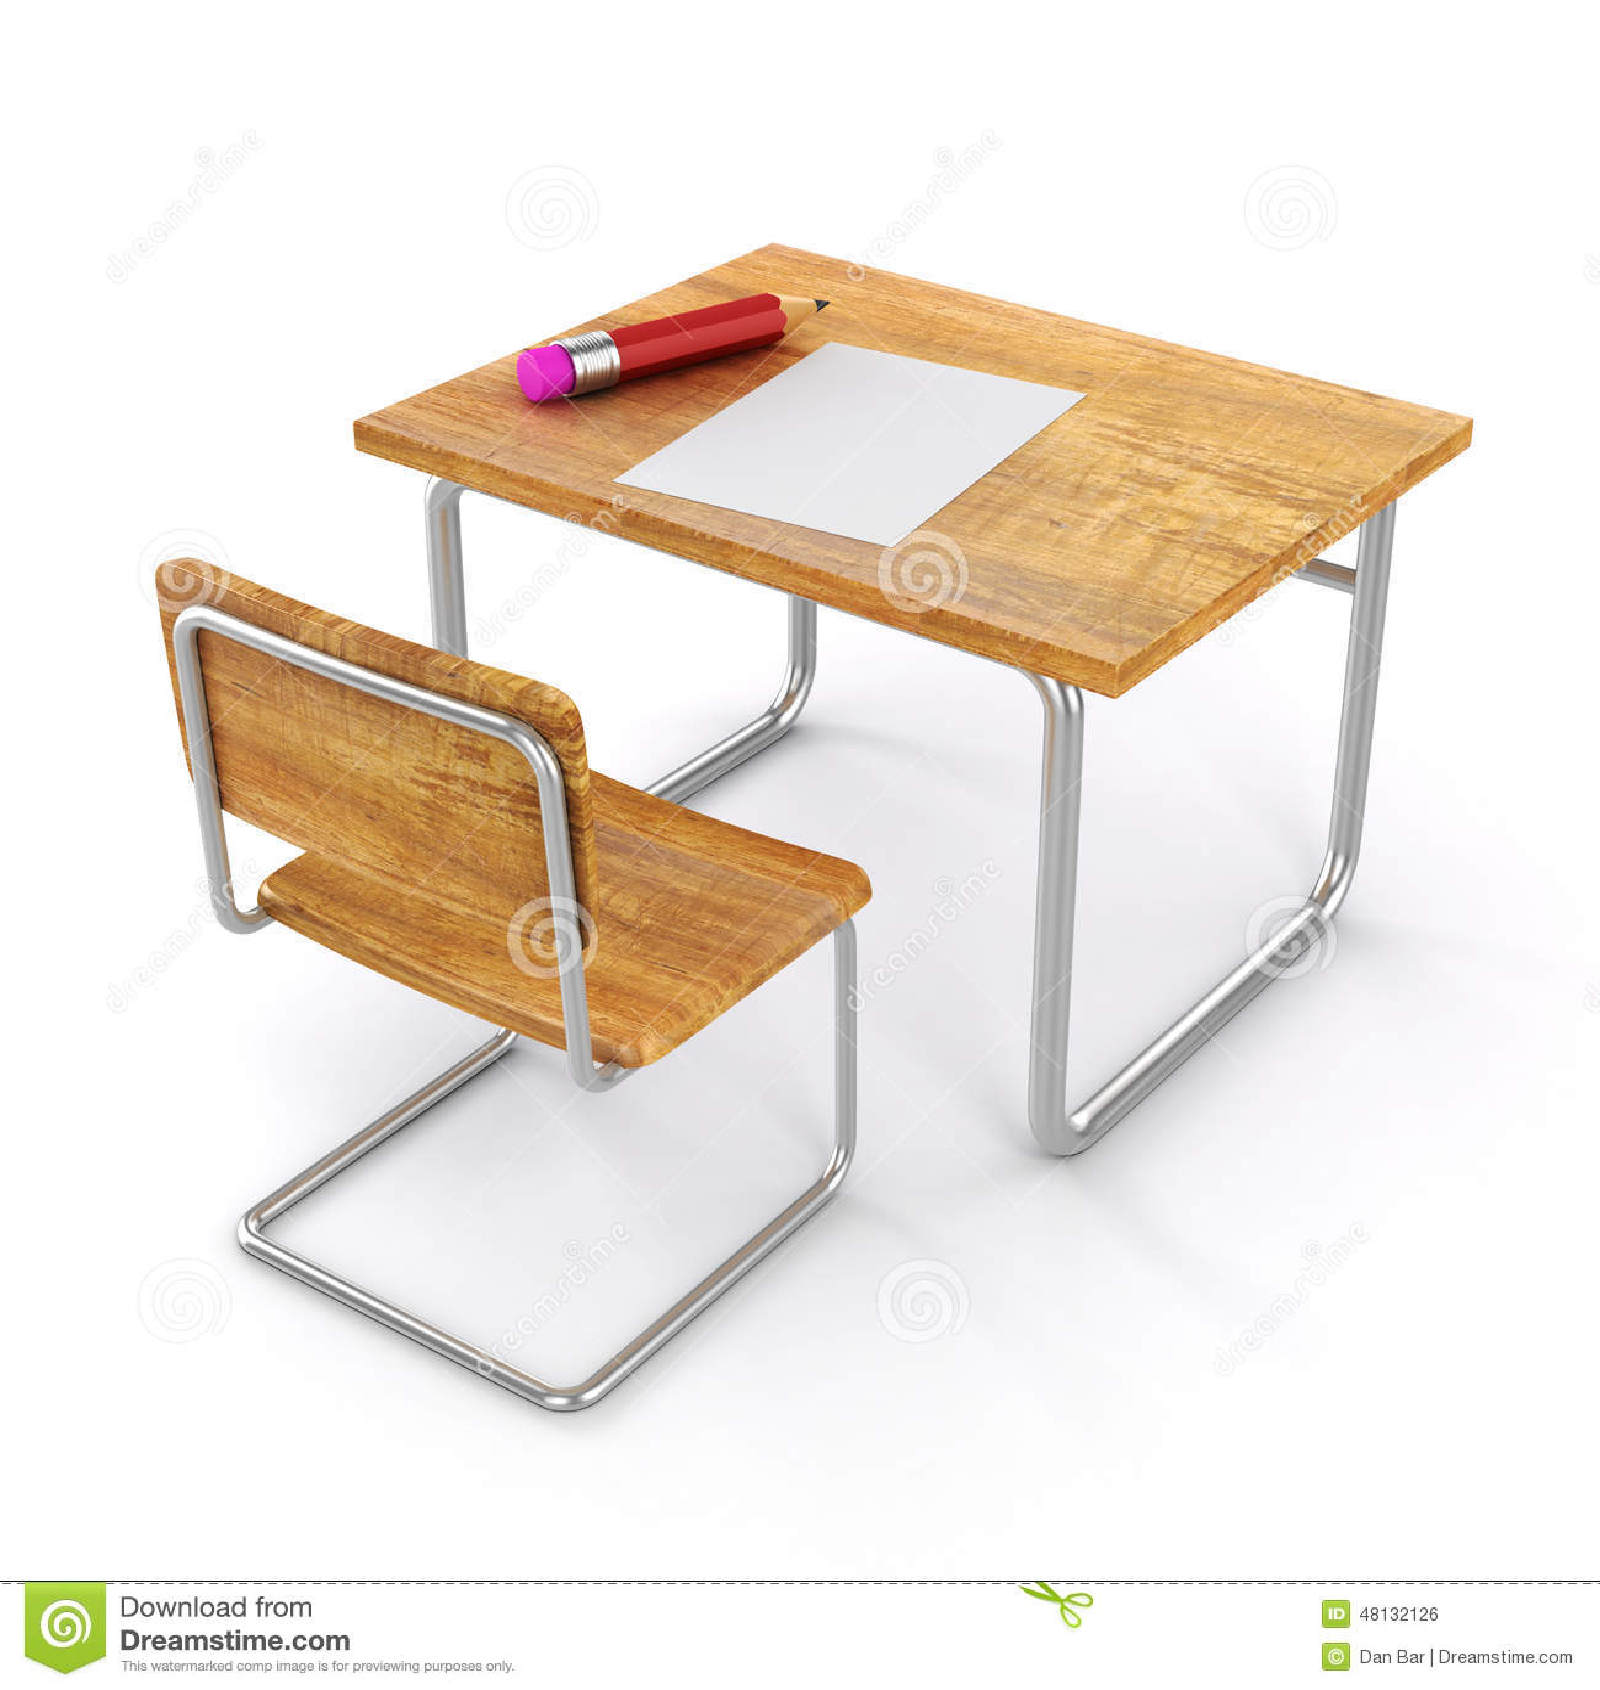 school desk background - photo #42